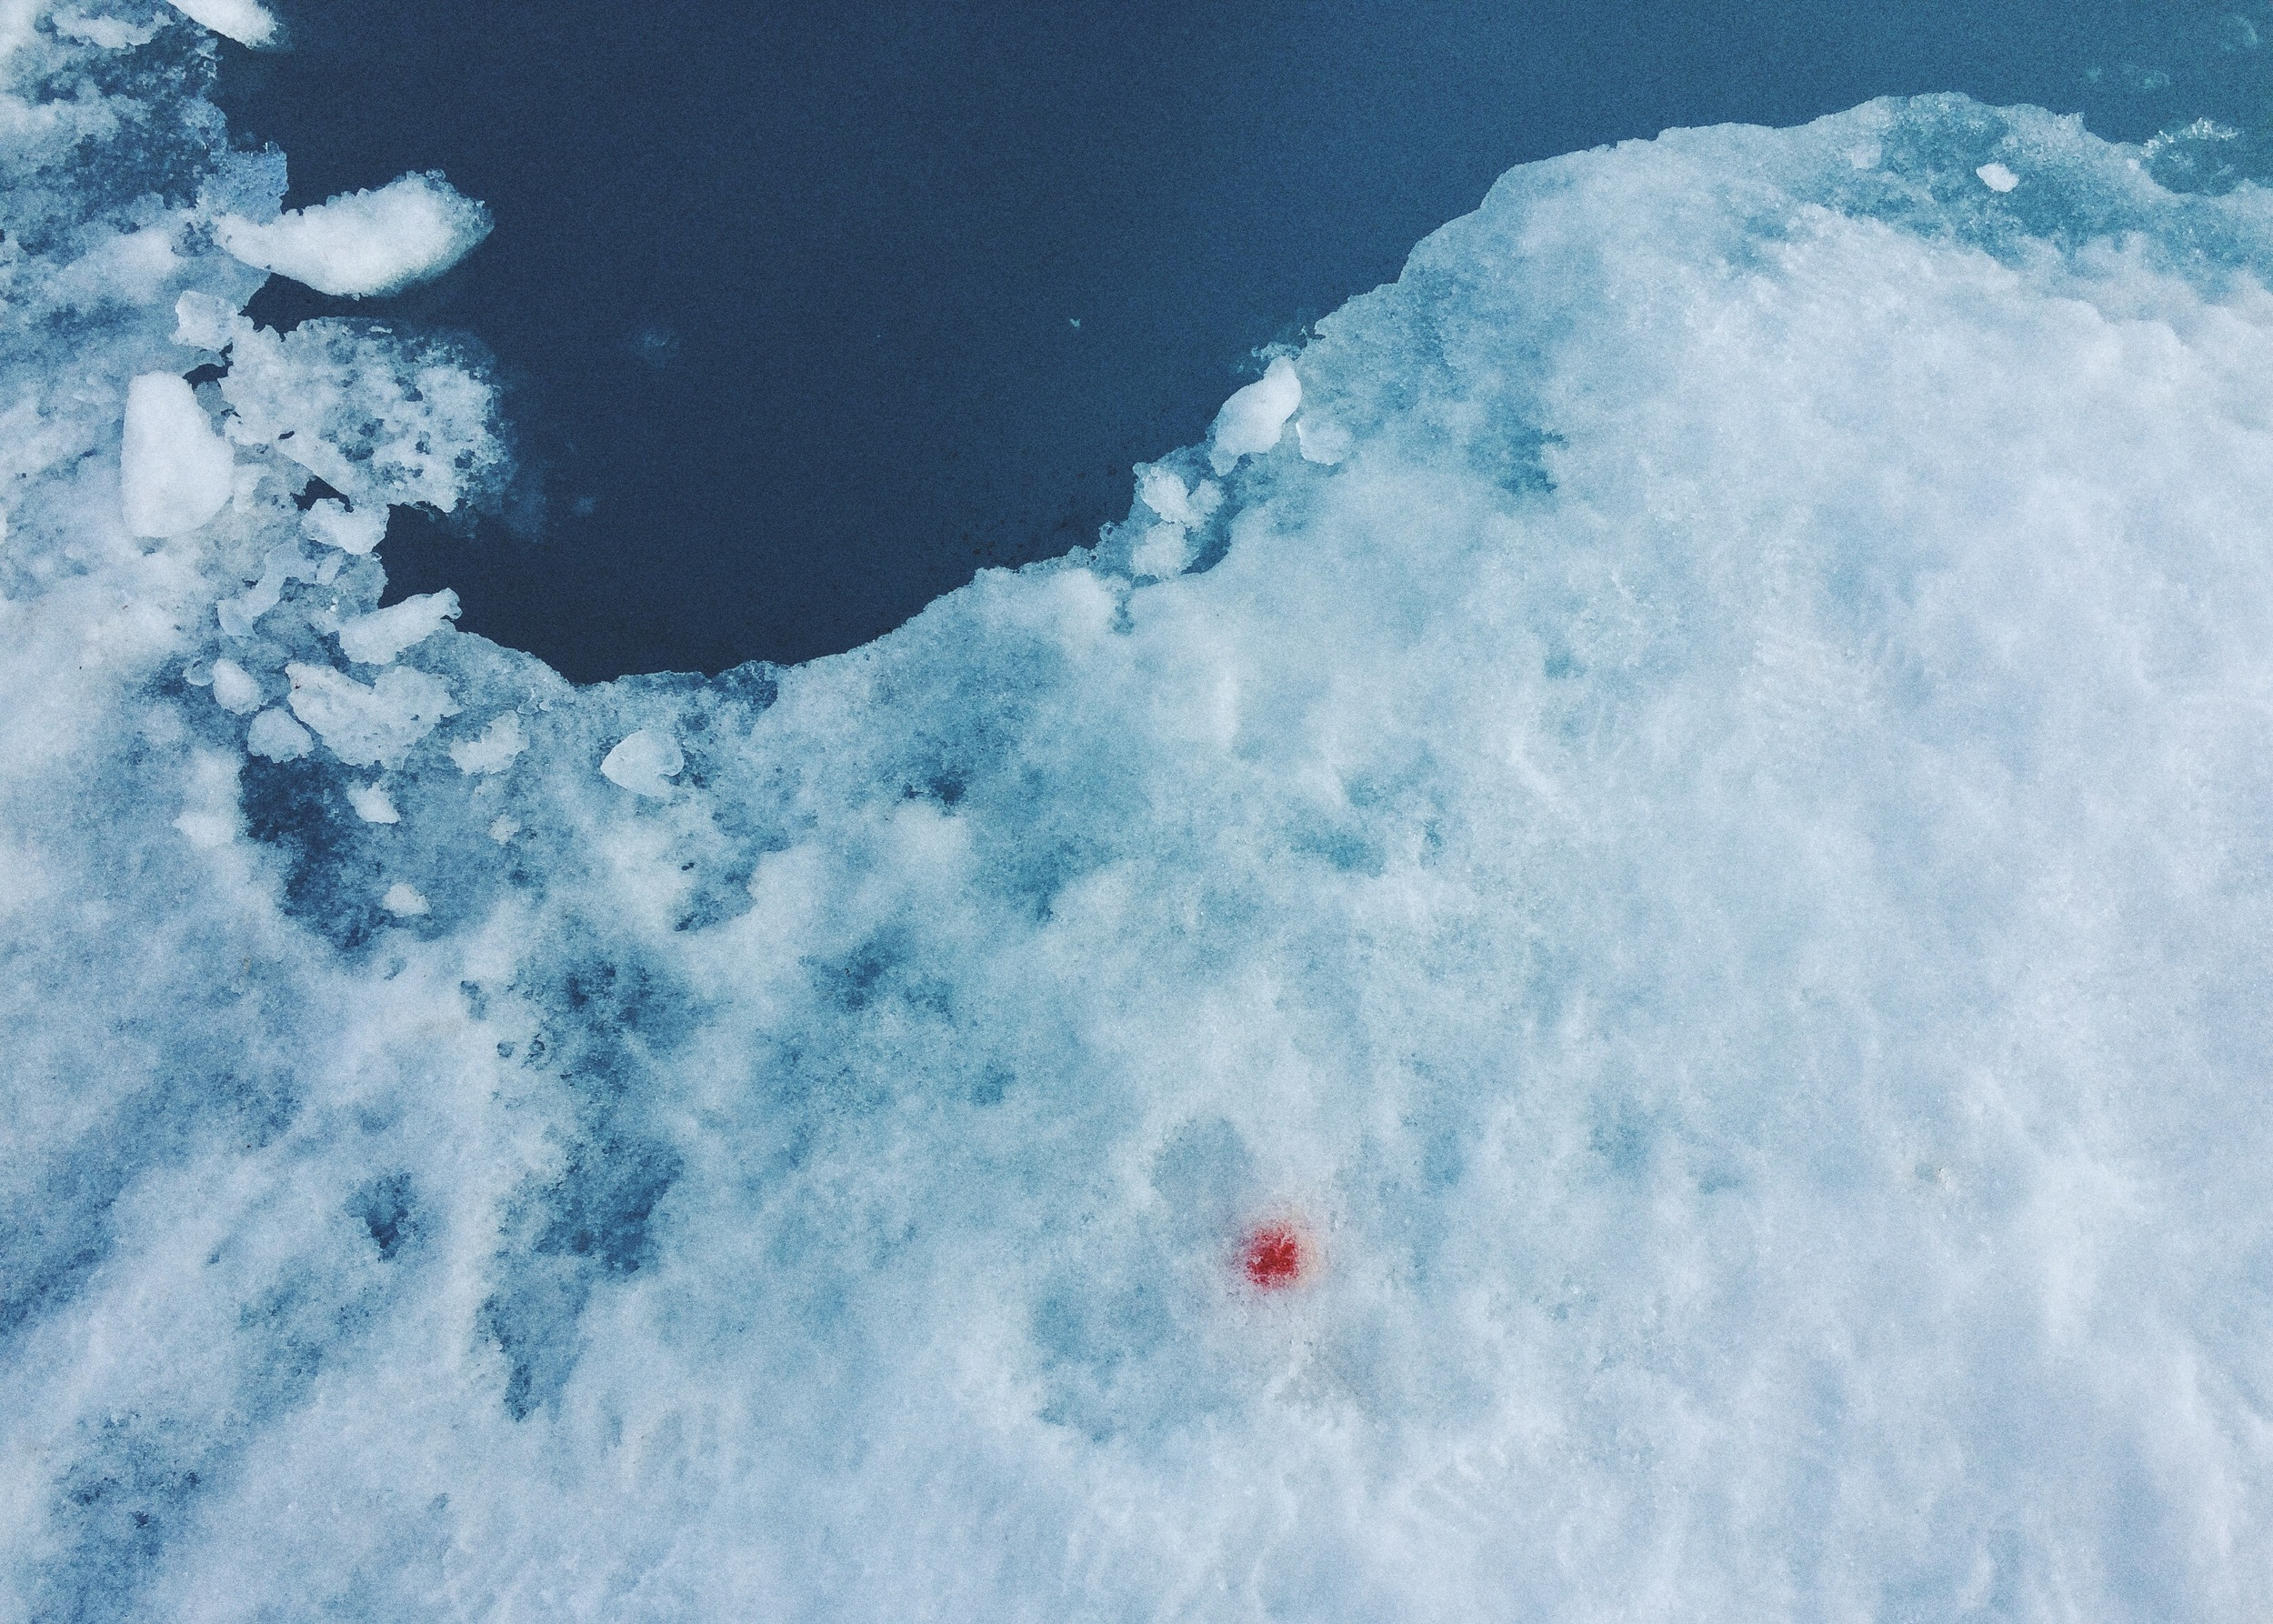 4 weeks in Ittoqqortoormiit, Greenland.